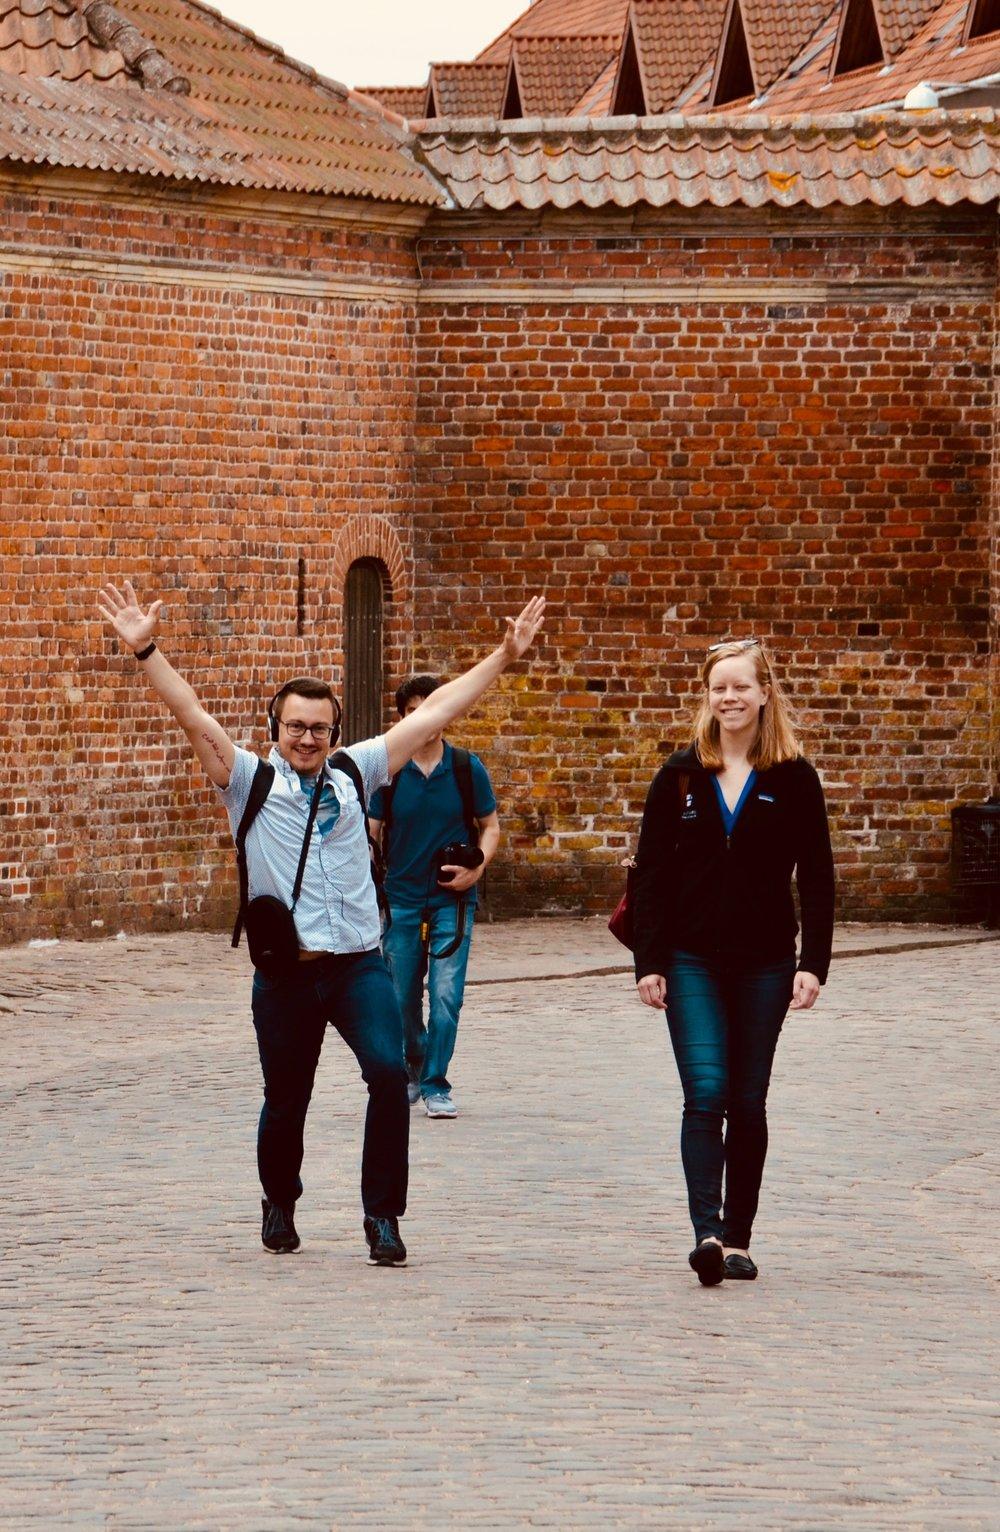 Corey De Tar and Laura Gullett arrive at Frederiksborg Castle, Hillerød, Denmark.